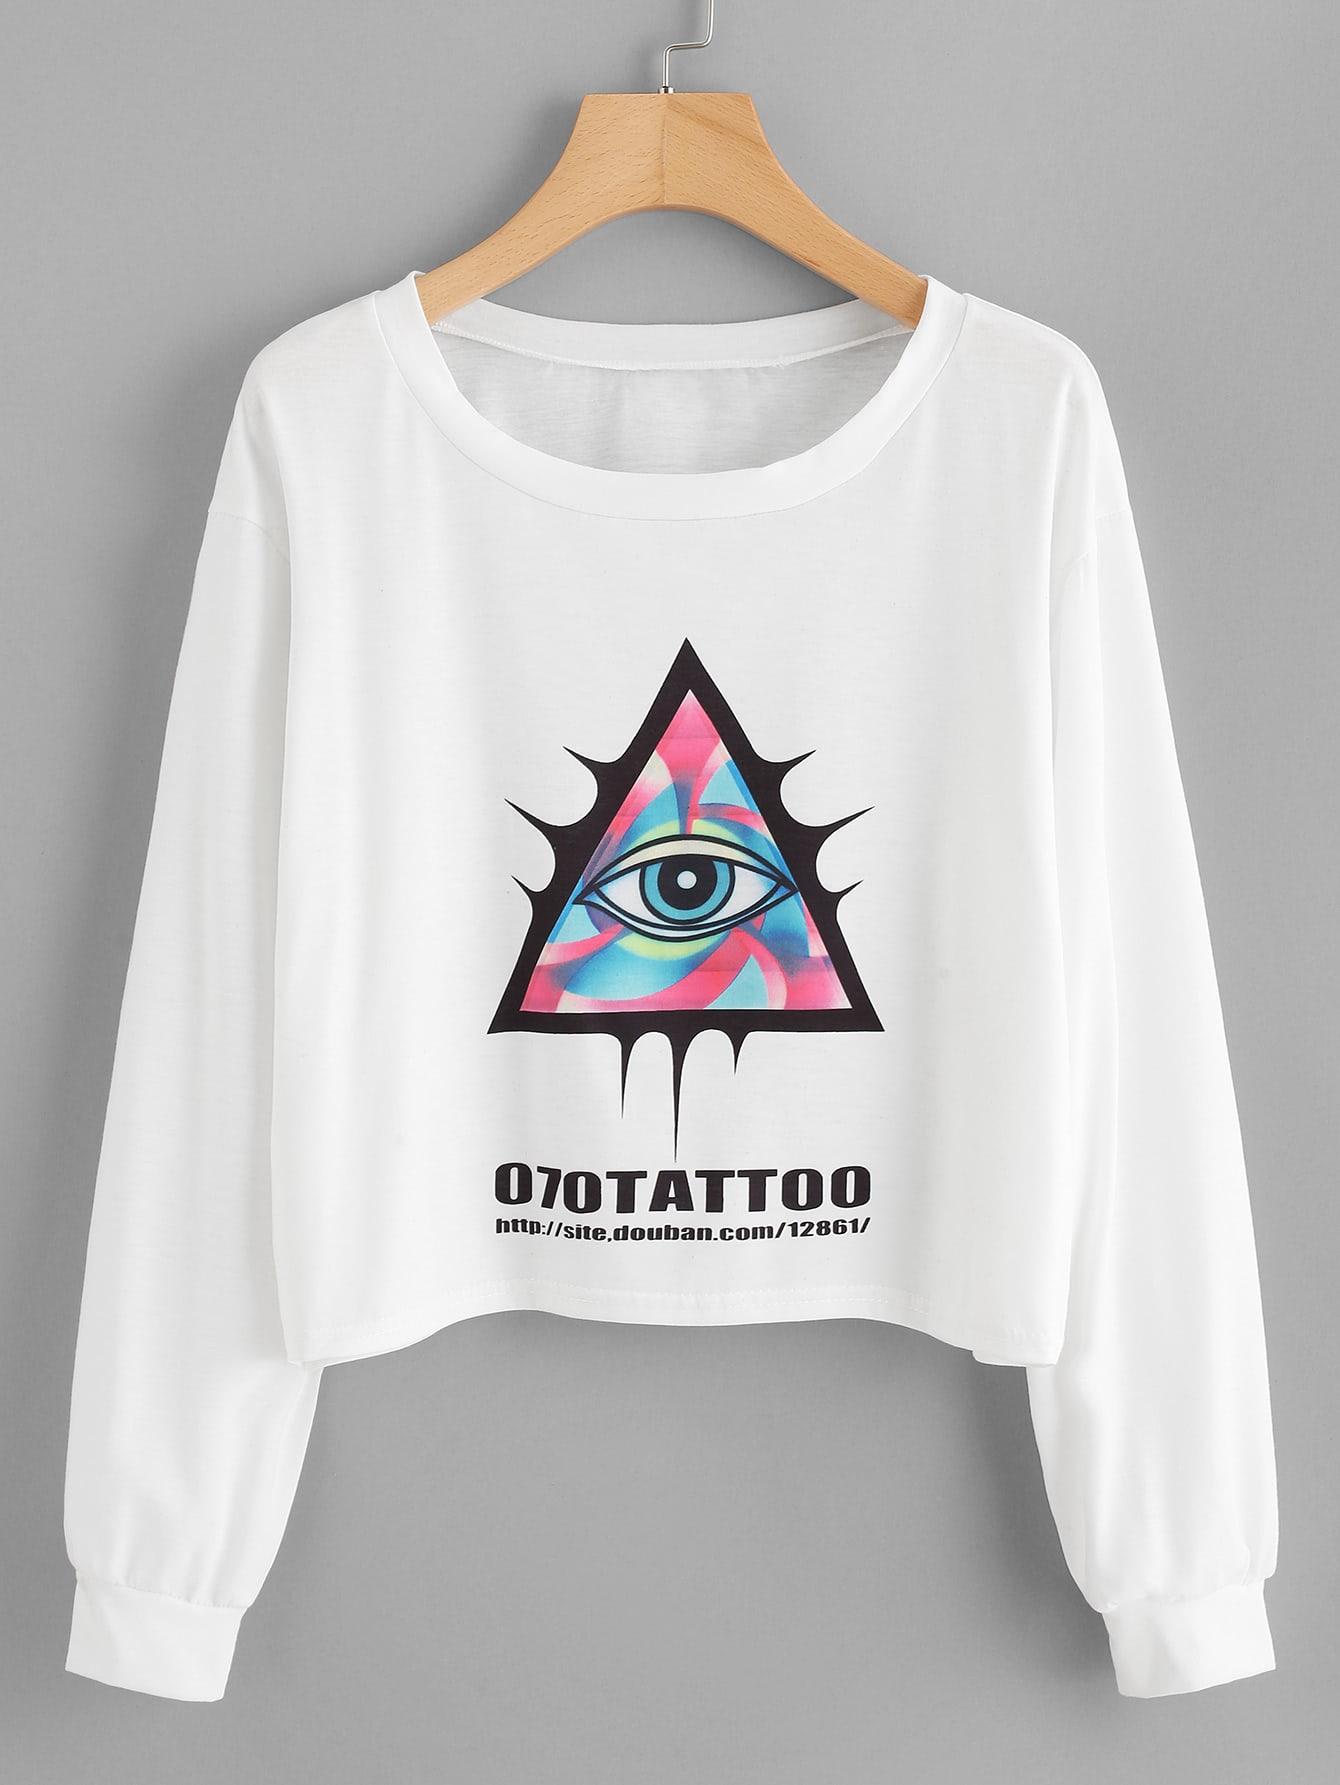 Graphic Print Tshirt graphic print fit